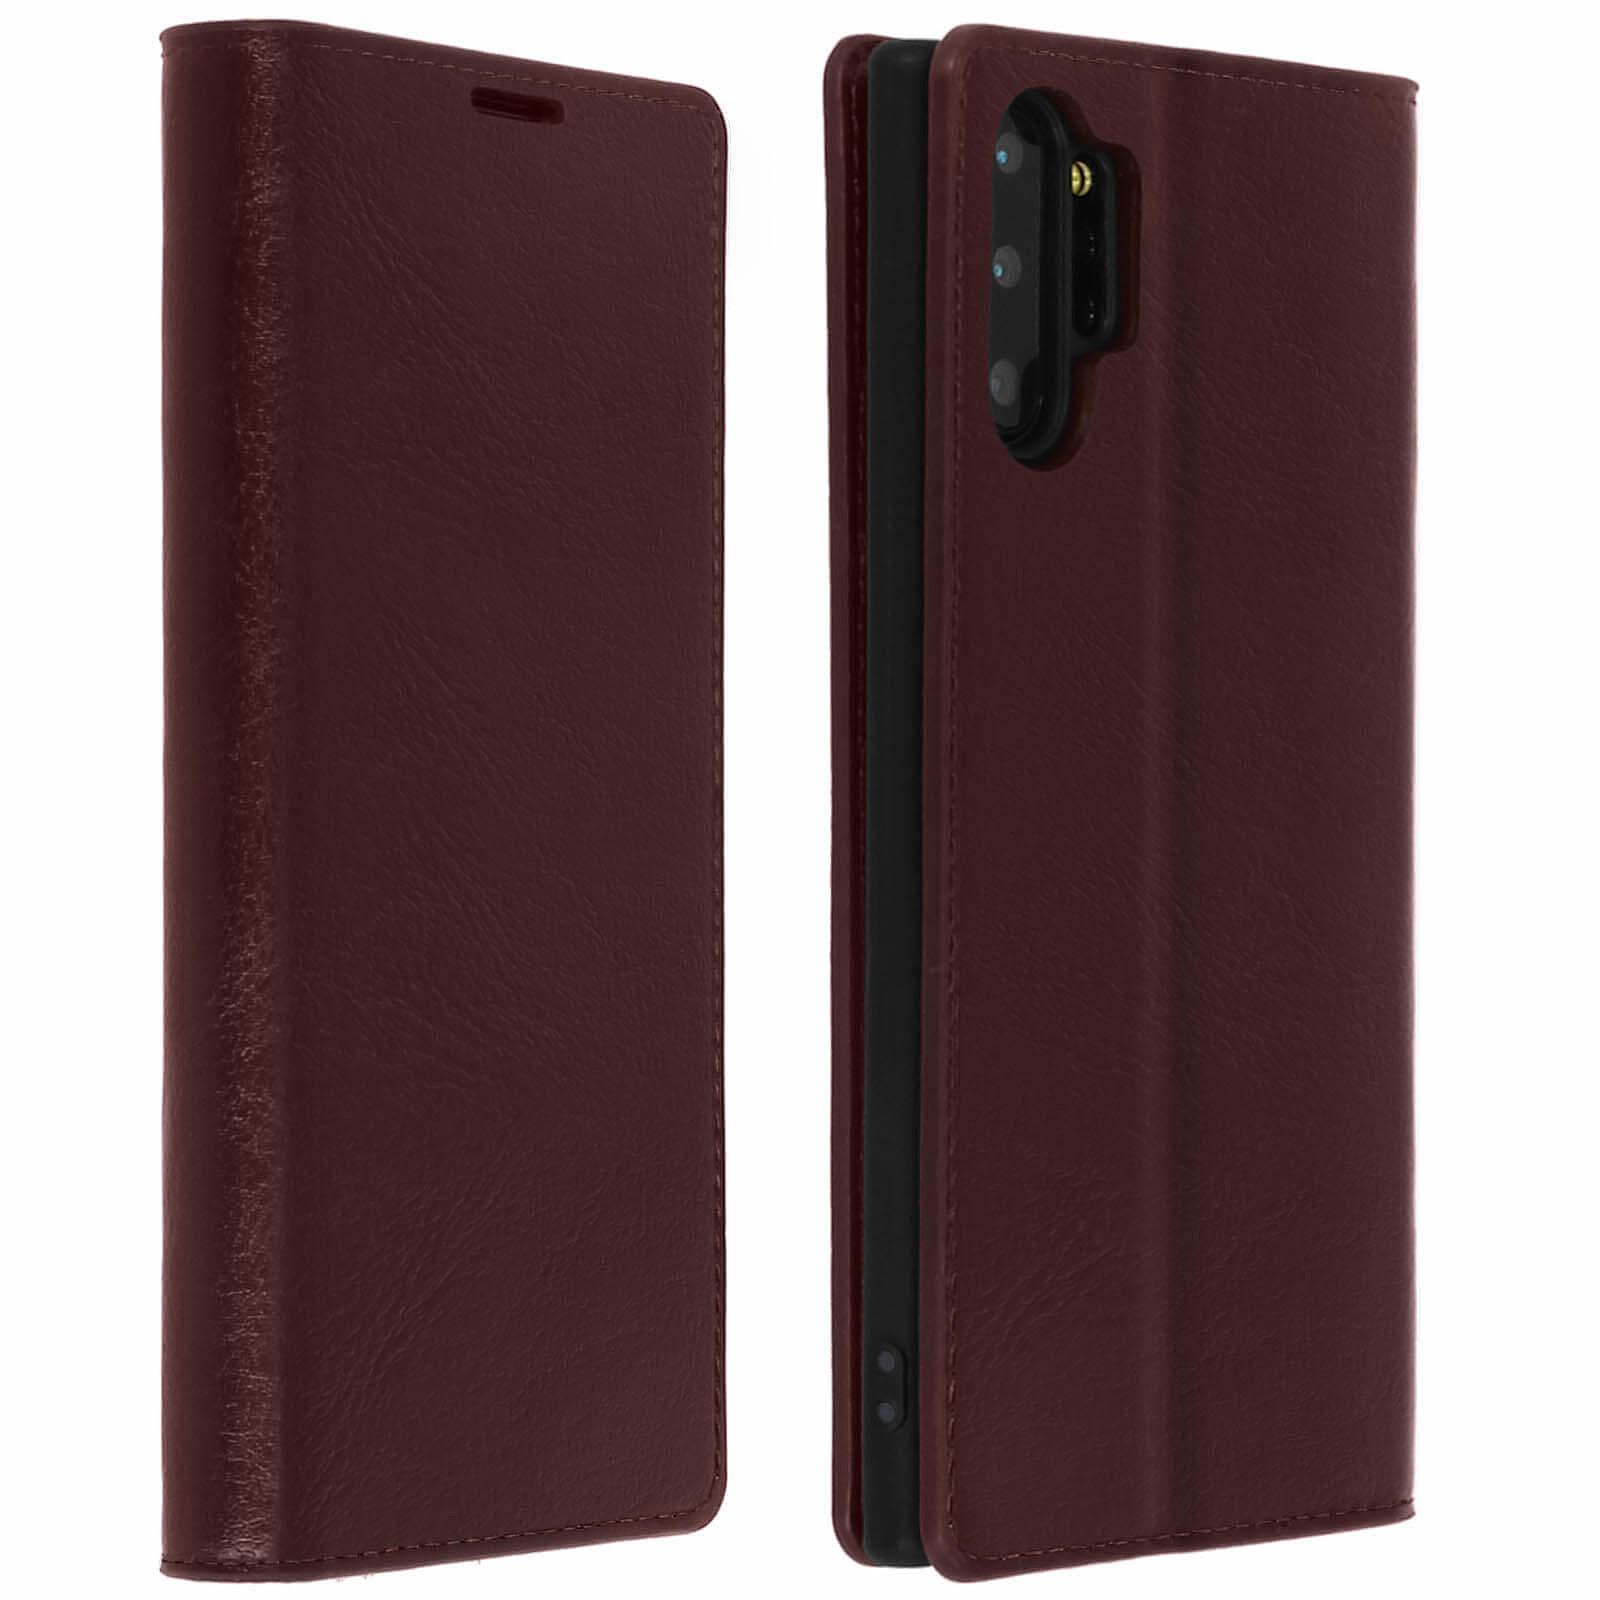 Avizar Etui folio Marron pour Samsung Galaxy Note 10 Plus